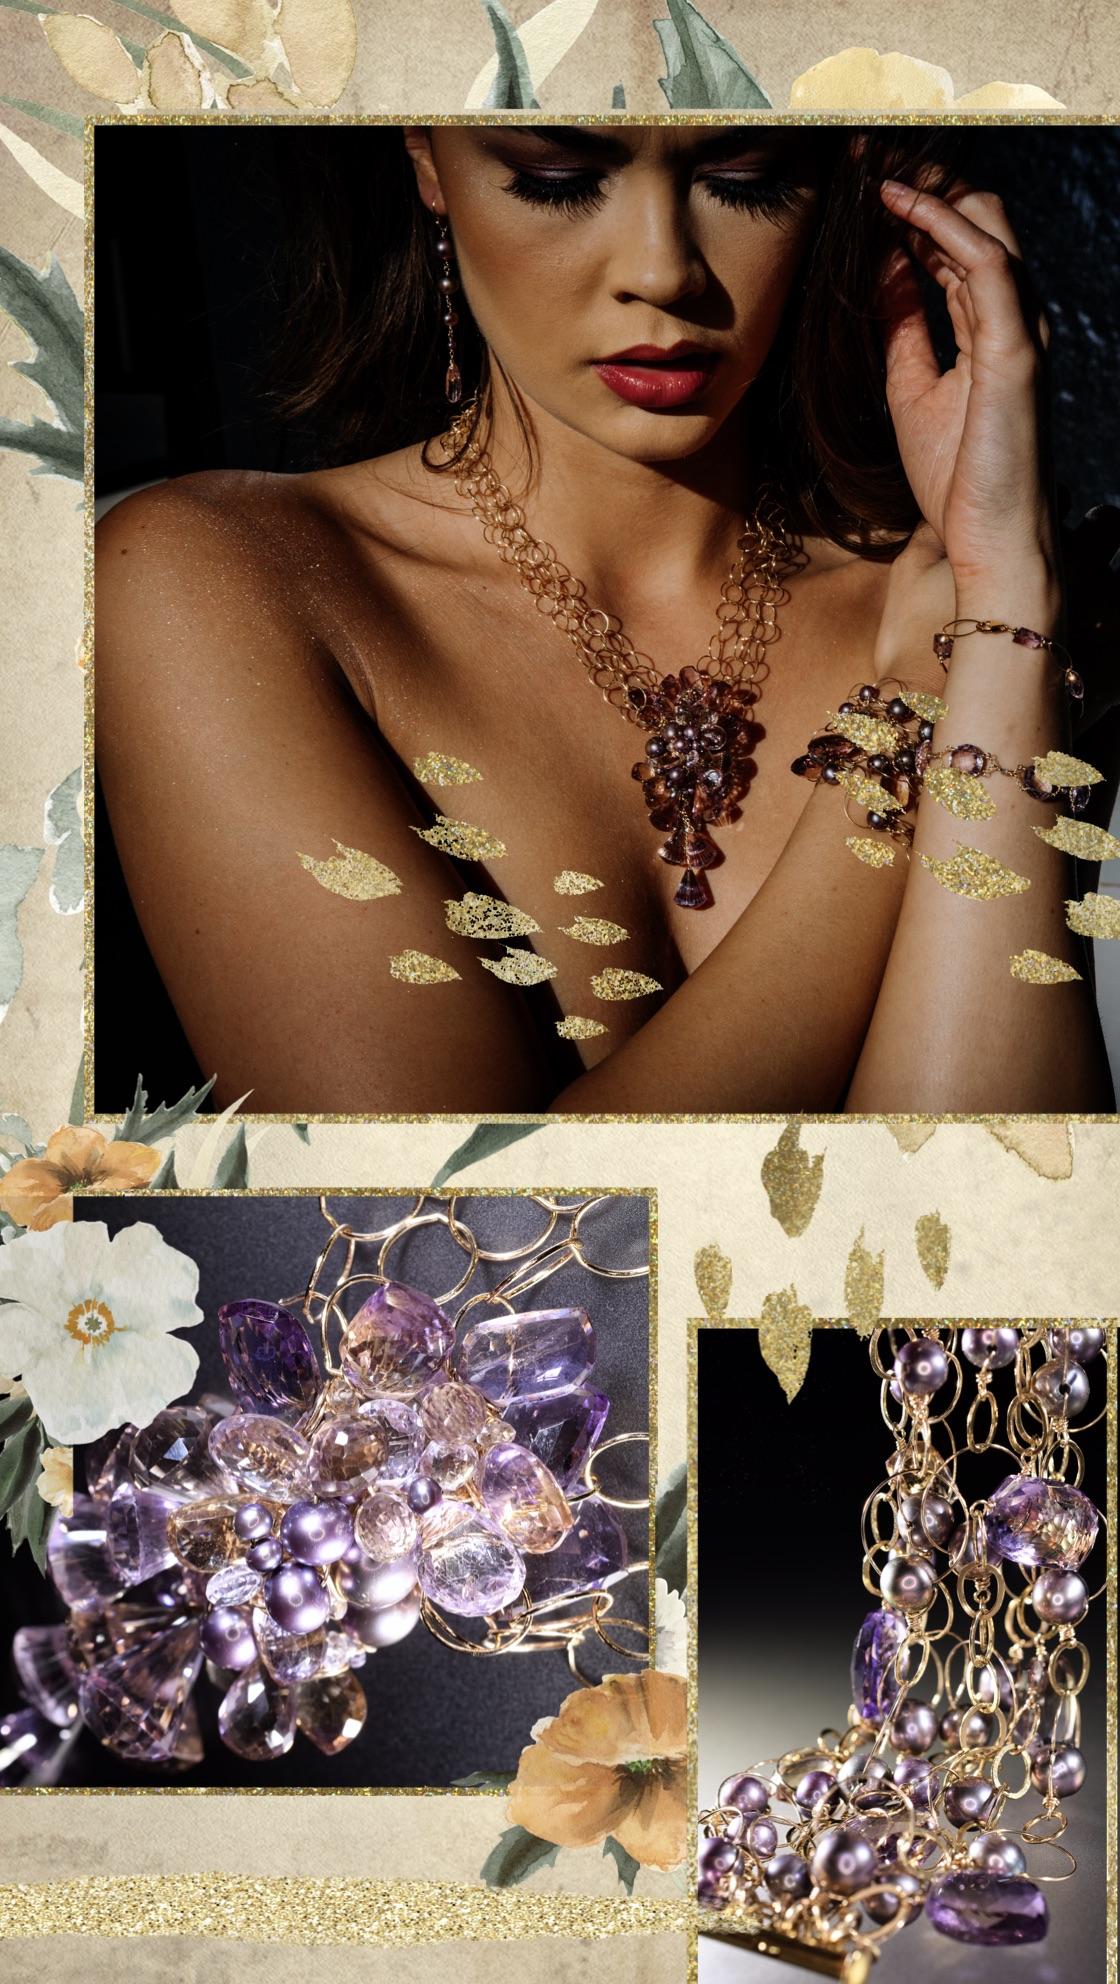 Eros Collection Lookbookhttps://andreali.com/eros